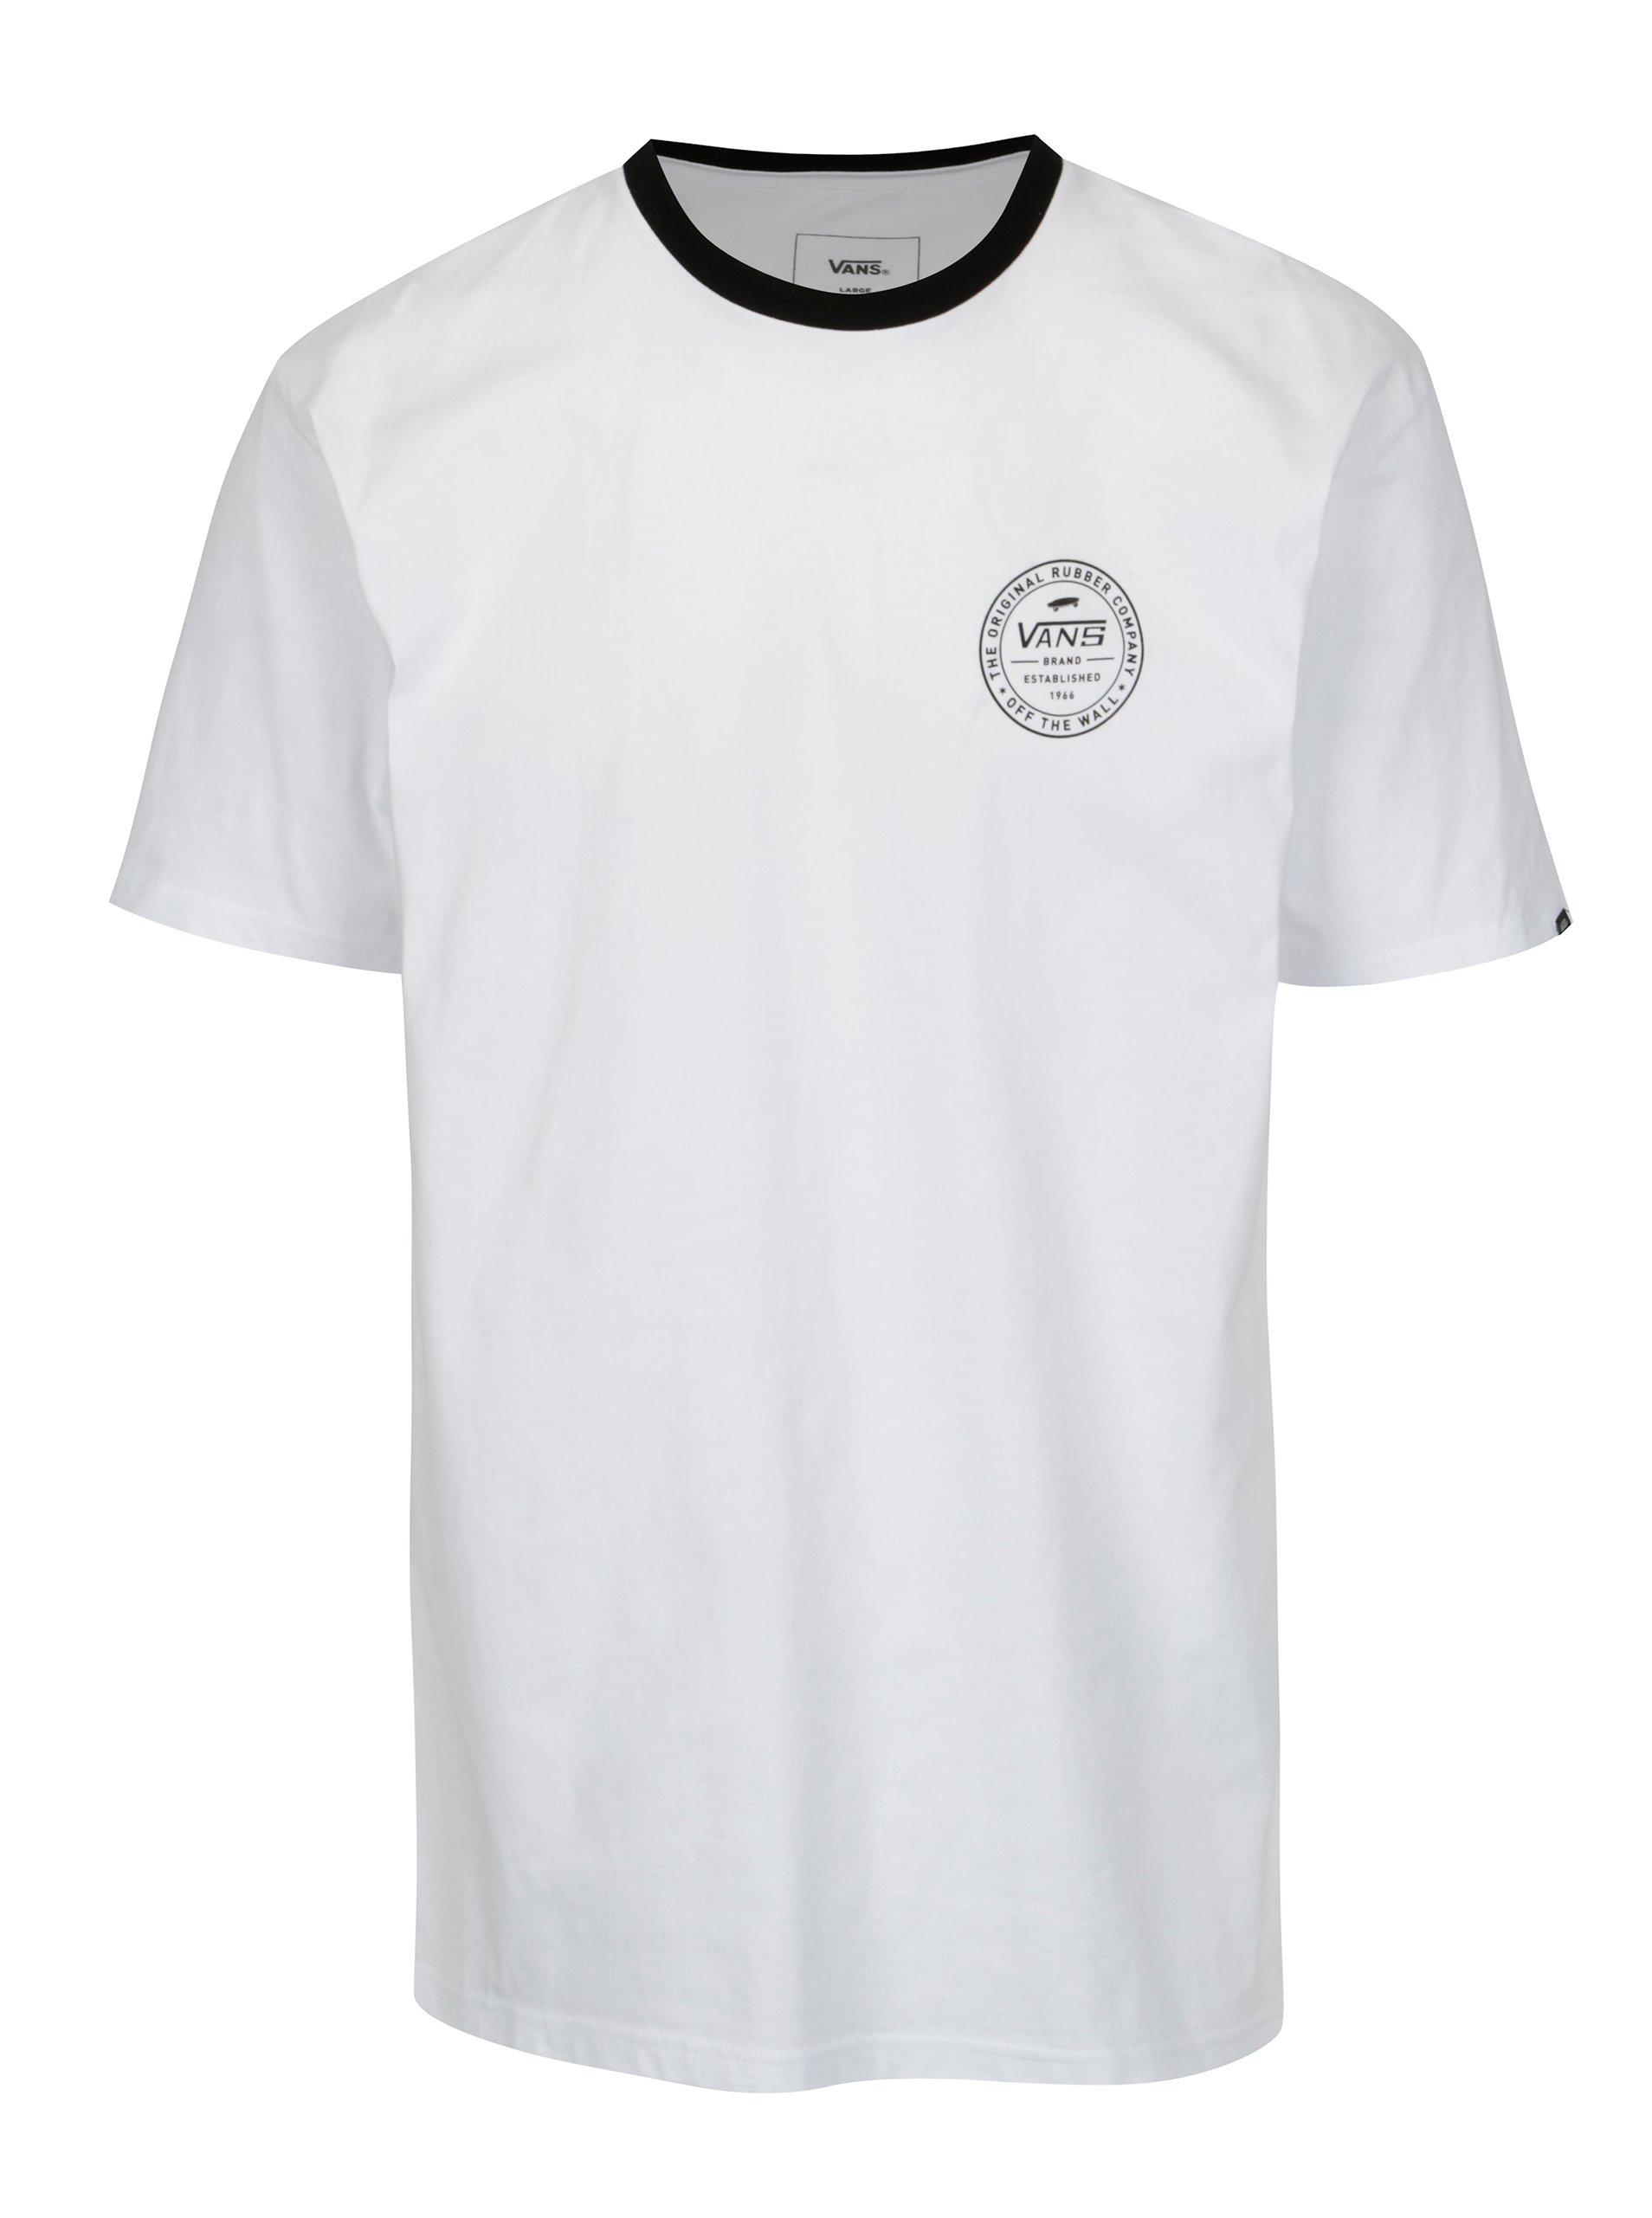 63458e96c Čierno-biele pánske tričko VANS Established | Moda.sk